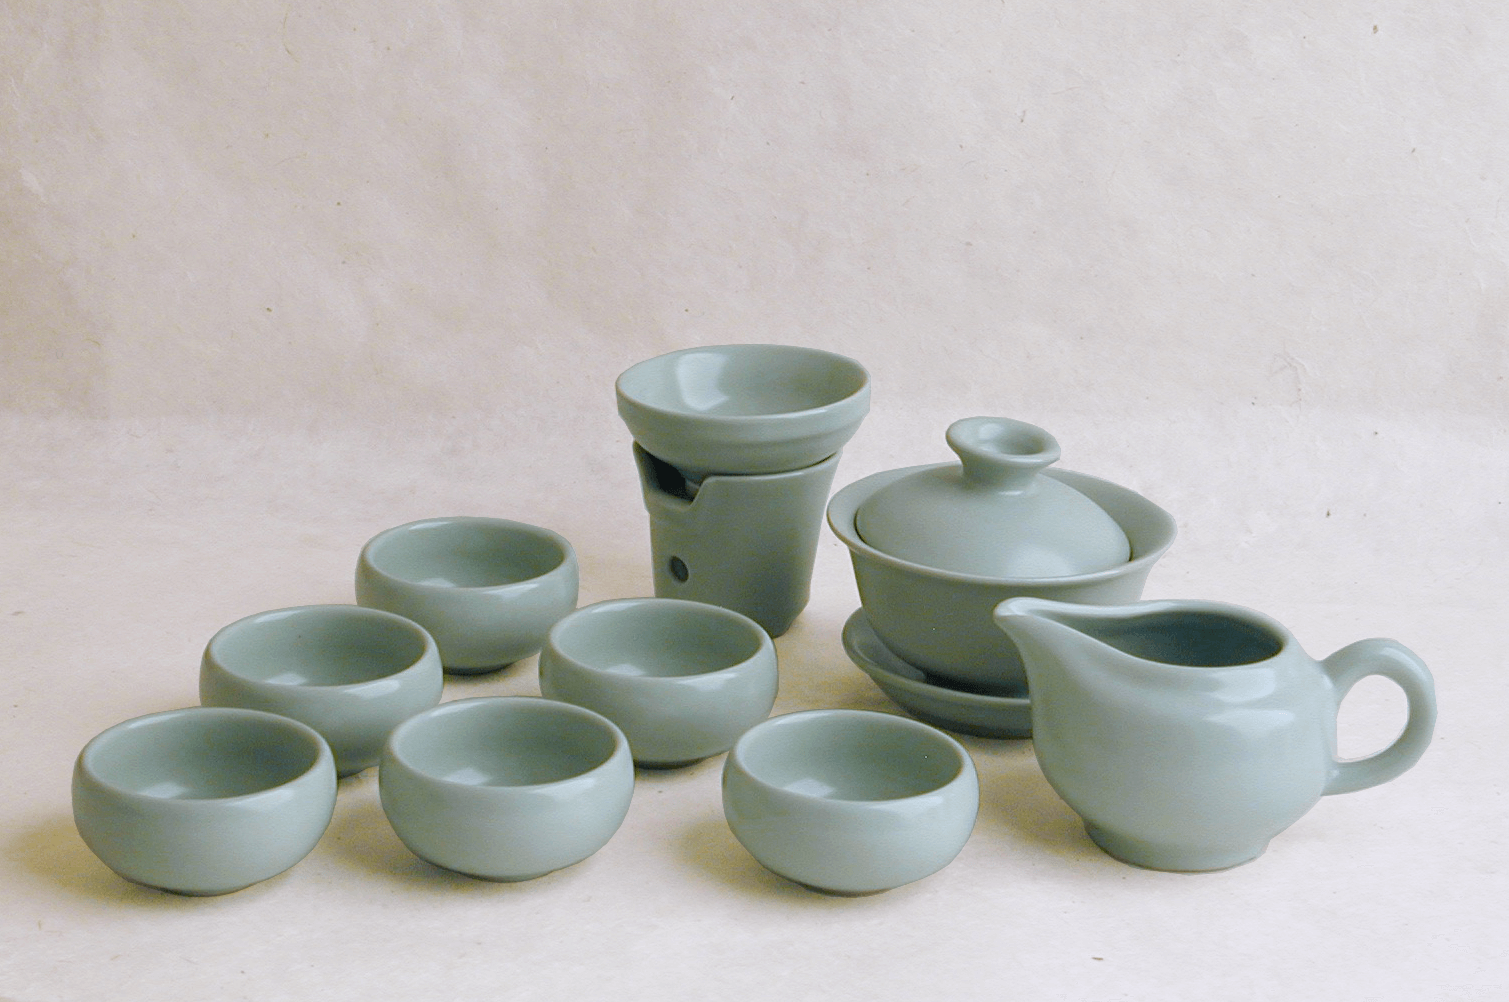 TEA SETS, GAIWANS AND MORE